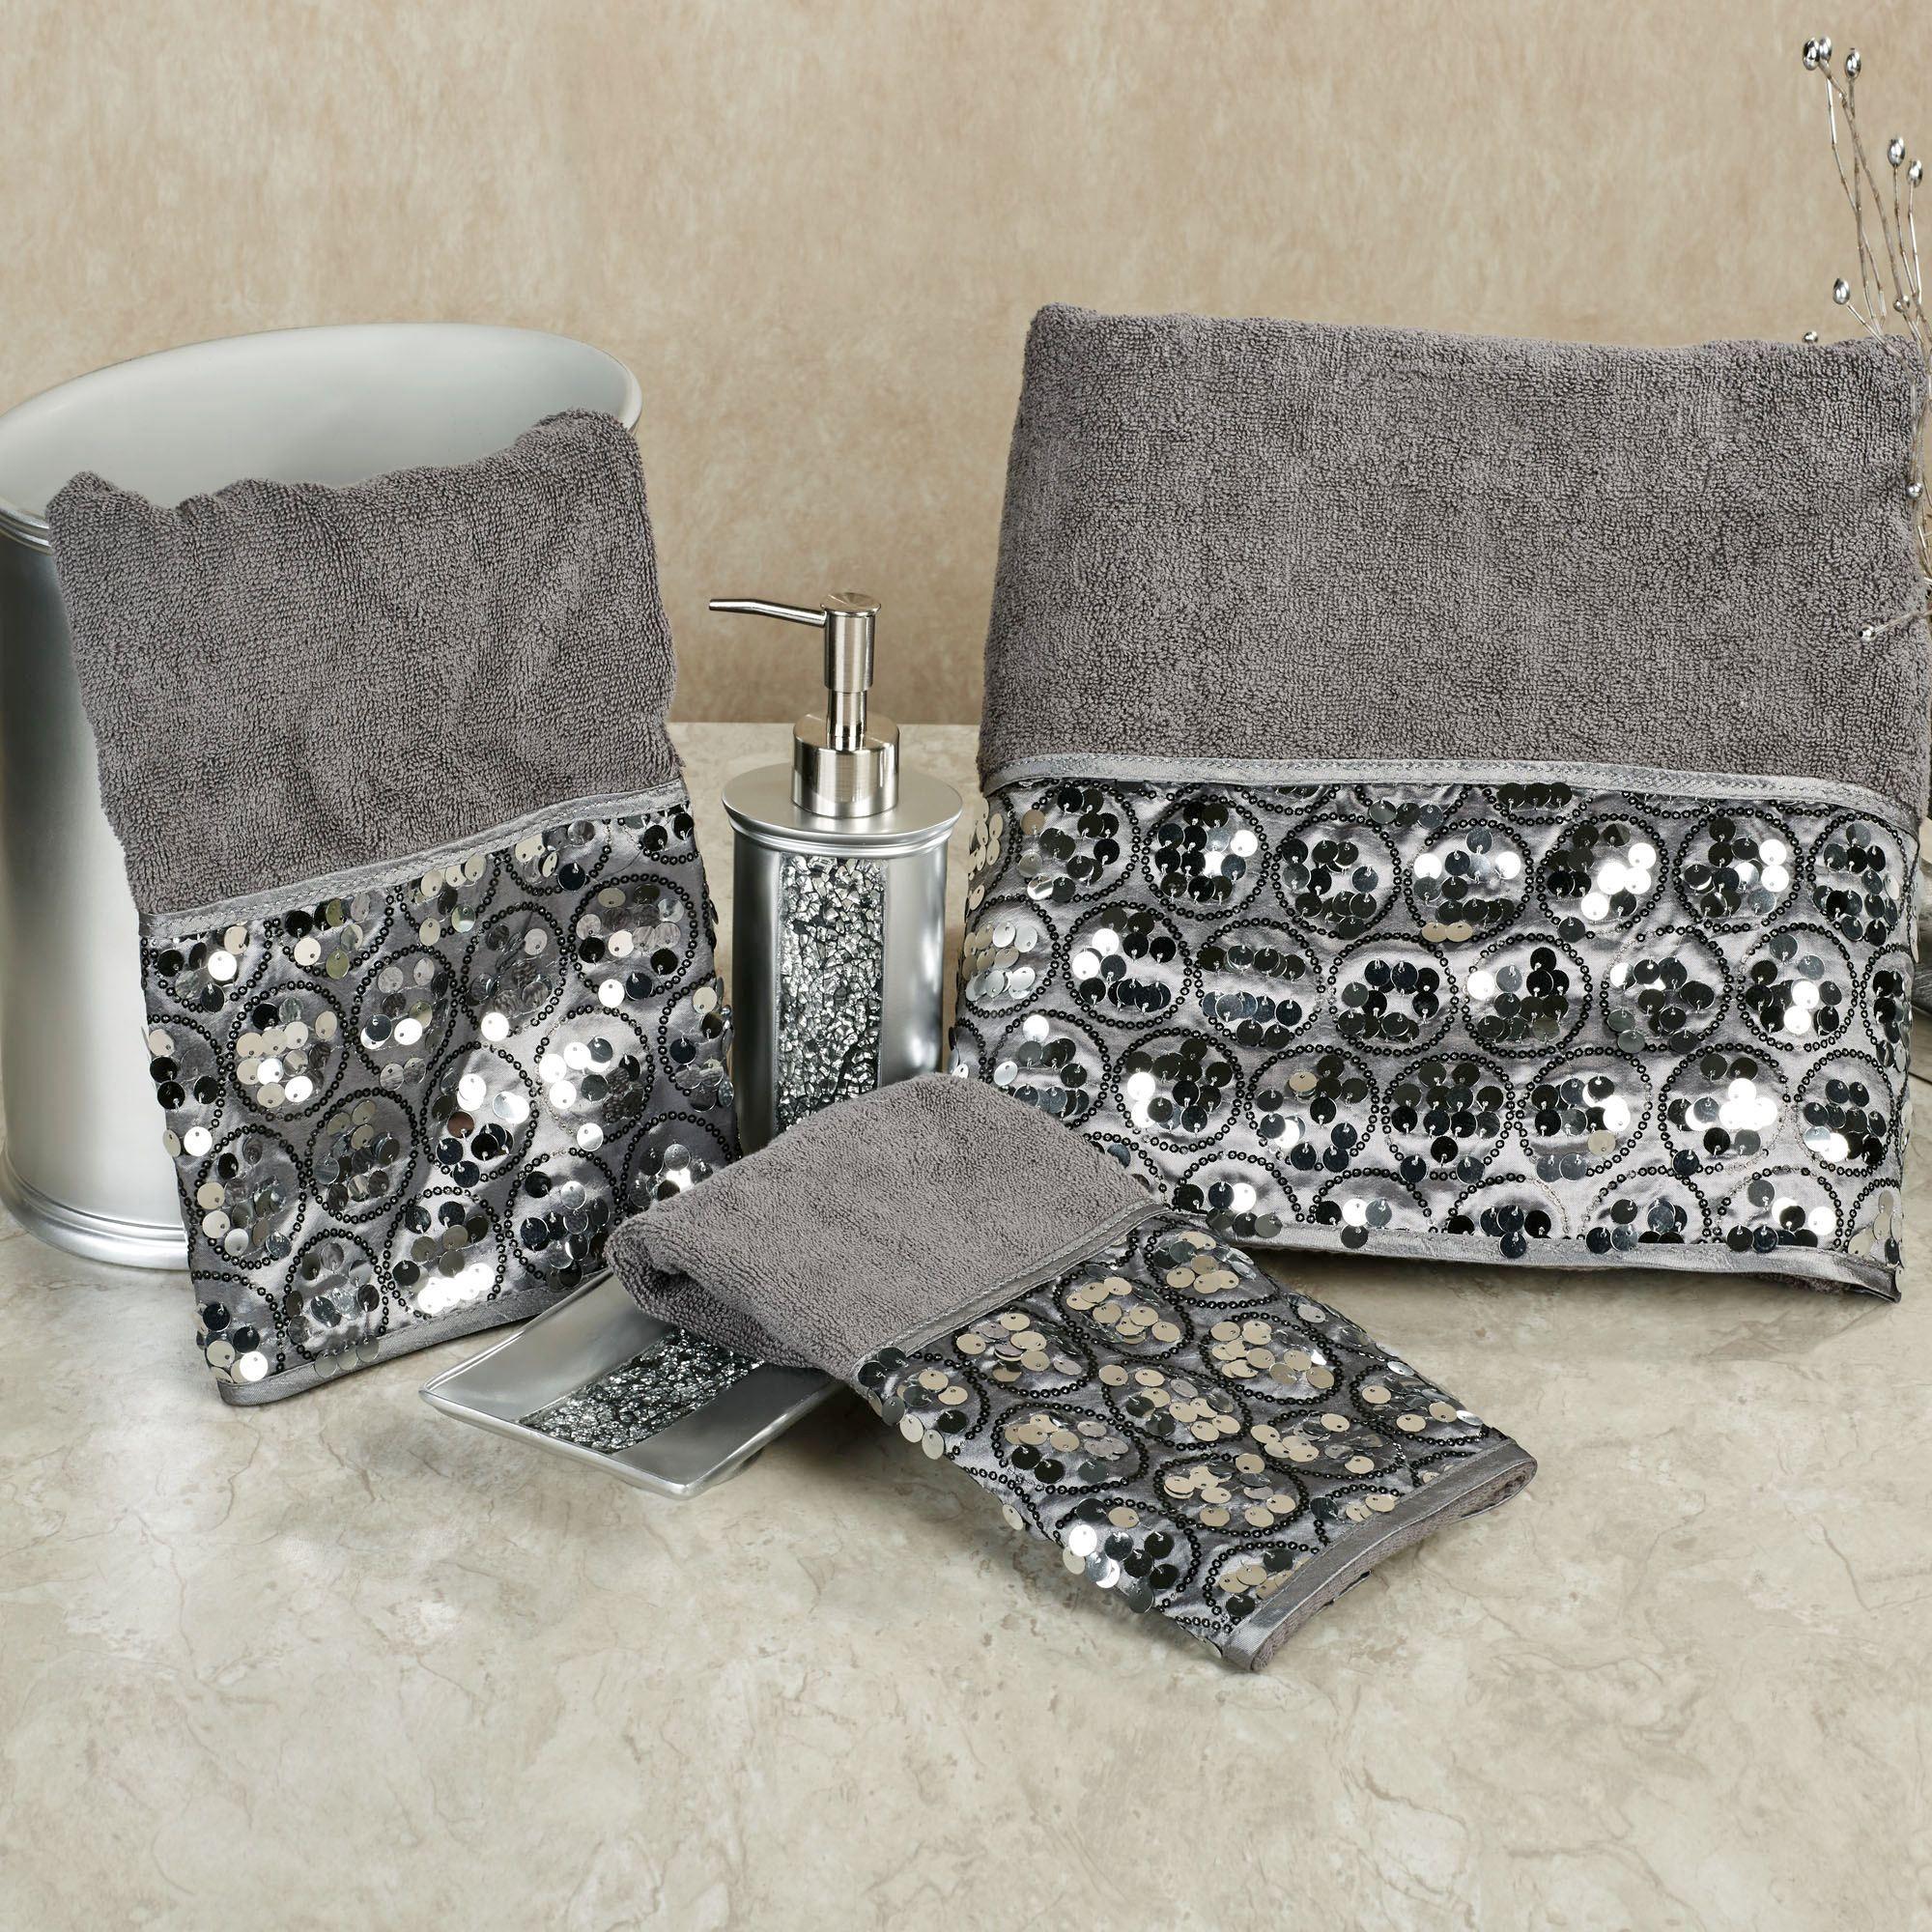 Bathroom Rugs And Shower Curtains Sets Ideas Pinterest - Silver bath towels for small bathroom ideas